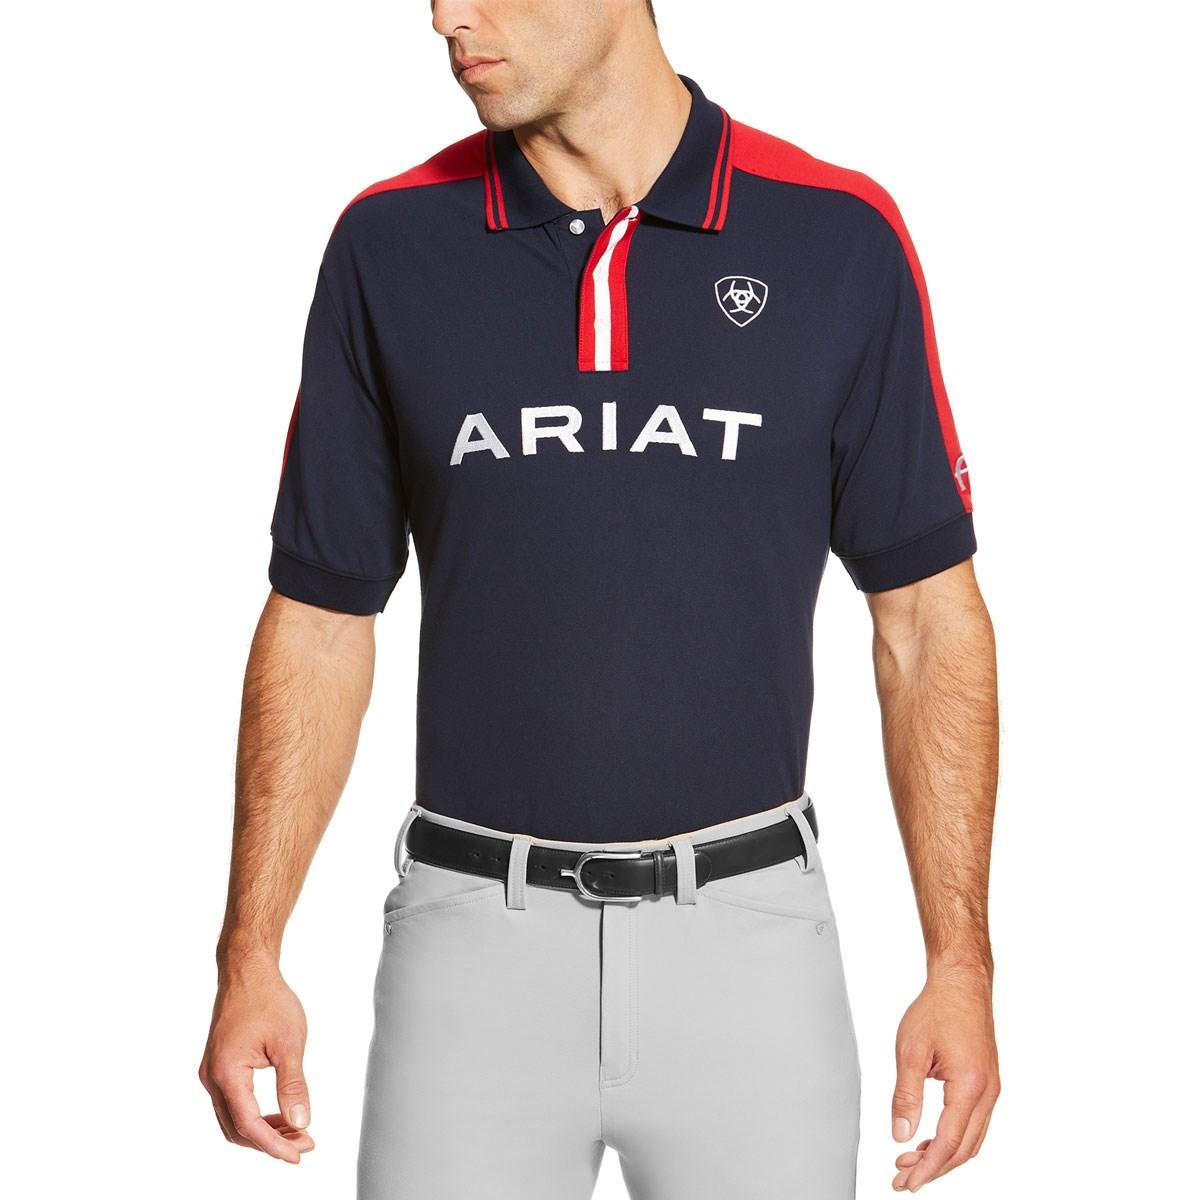 b9209b00 Ariat FEI New Team Polo Shirt Mens - Navy - Redpost Equestrian